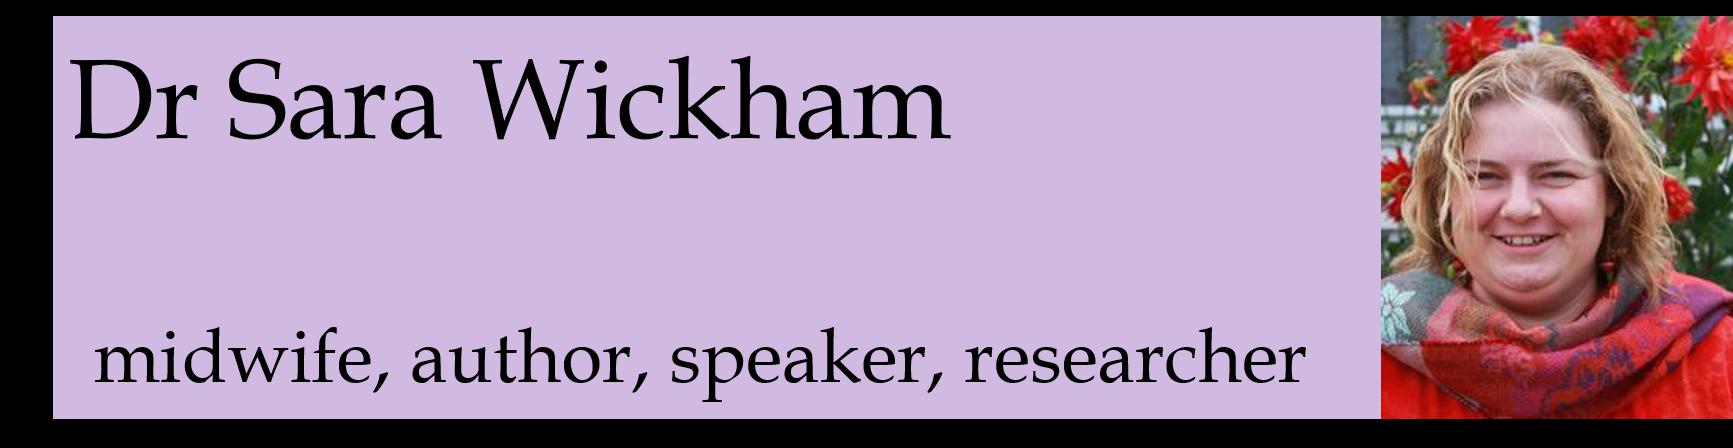 sarawickham